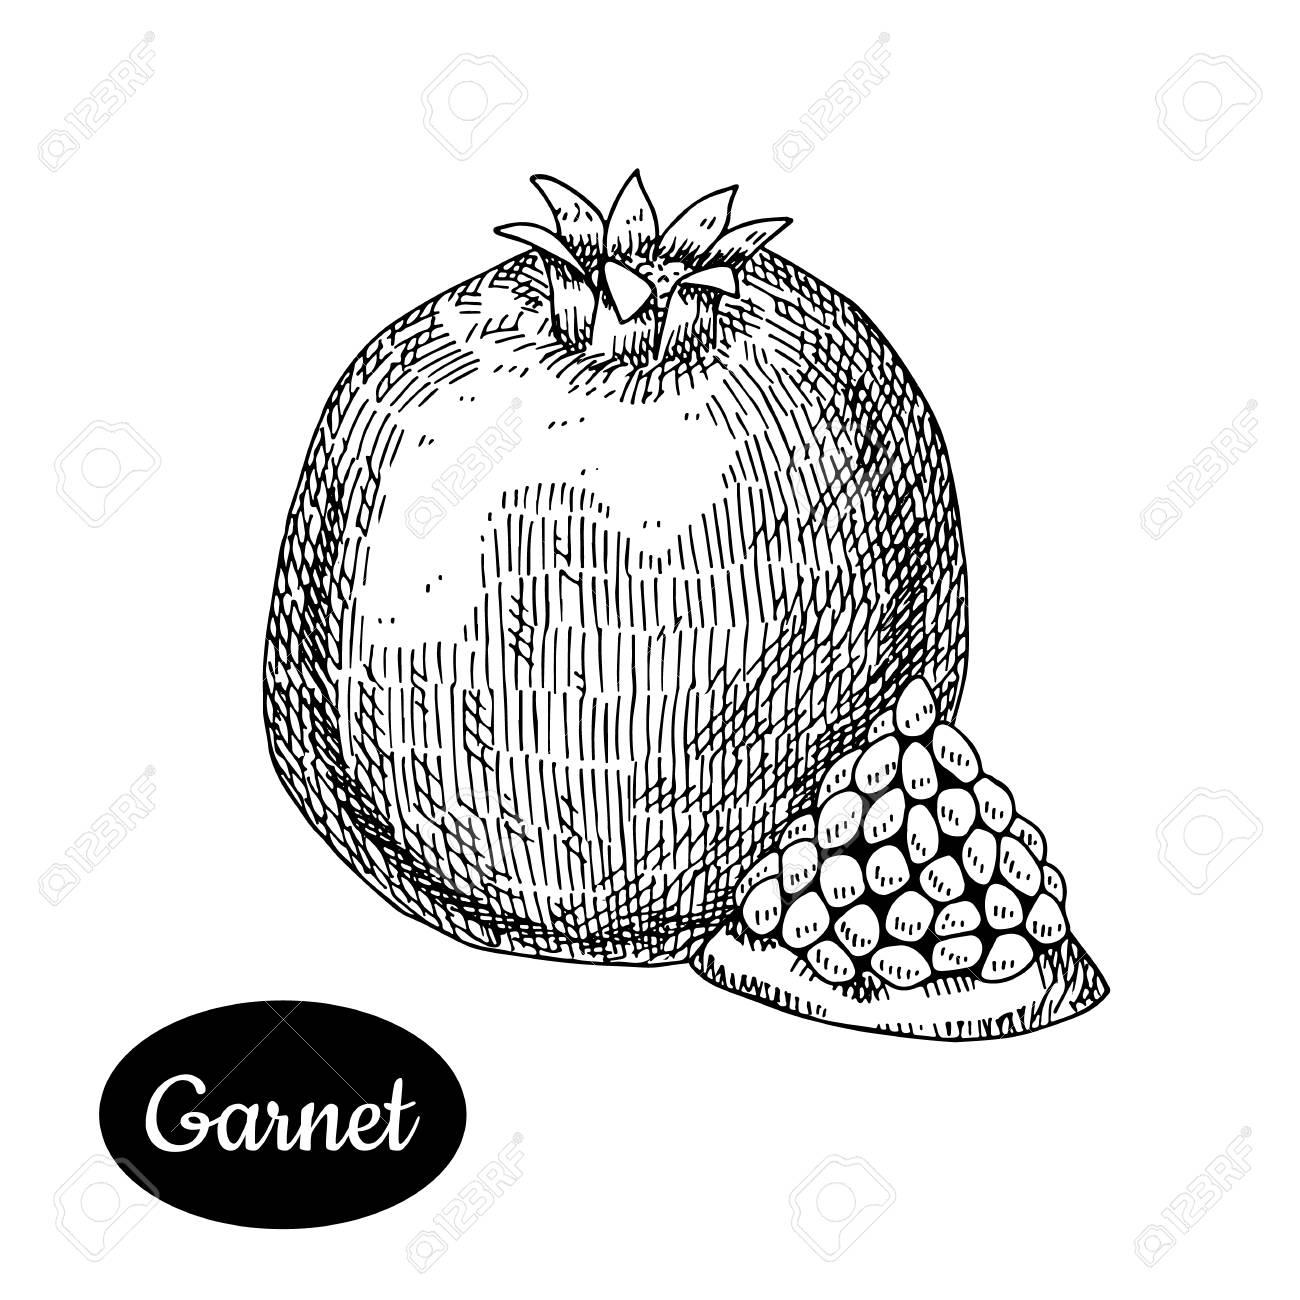 Granada Fresca Esboco Desenhado A Mao Ilustracao Tropical Do